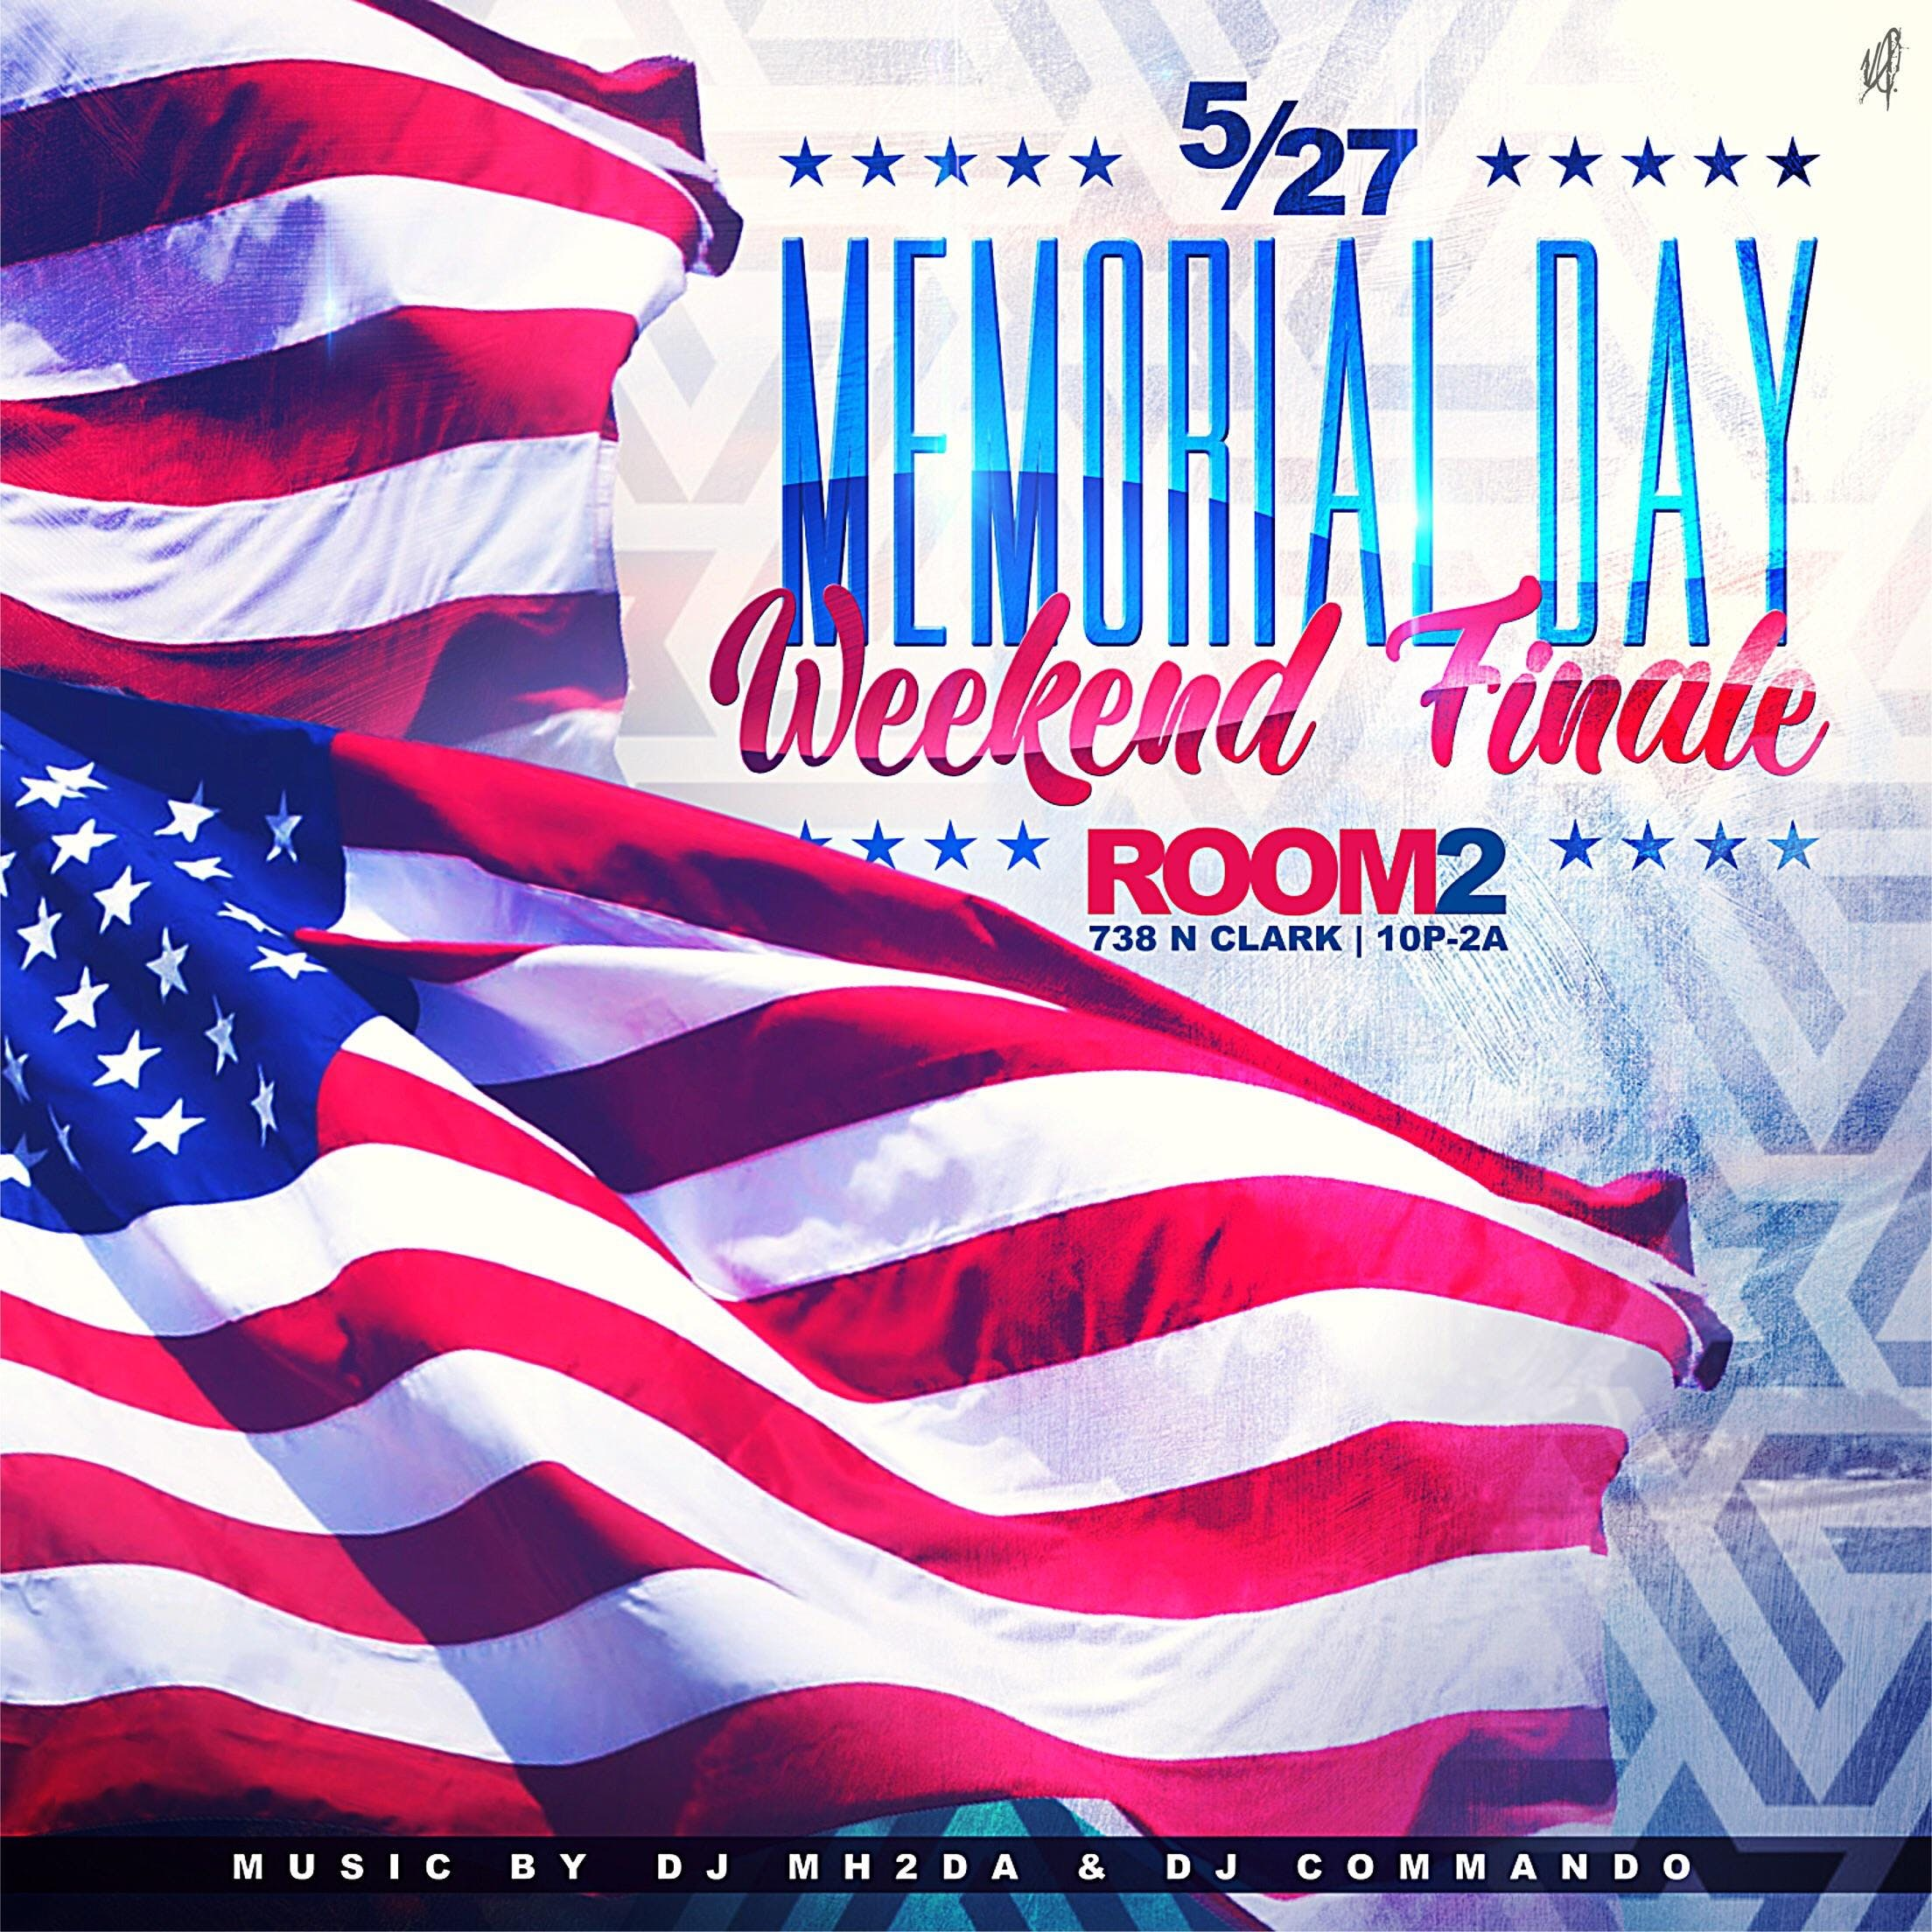 MEMORIAL DAY FINALE @ ROOM 2